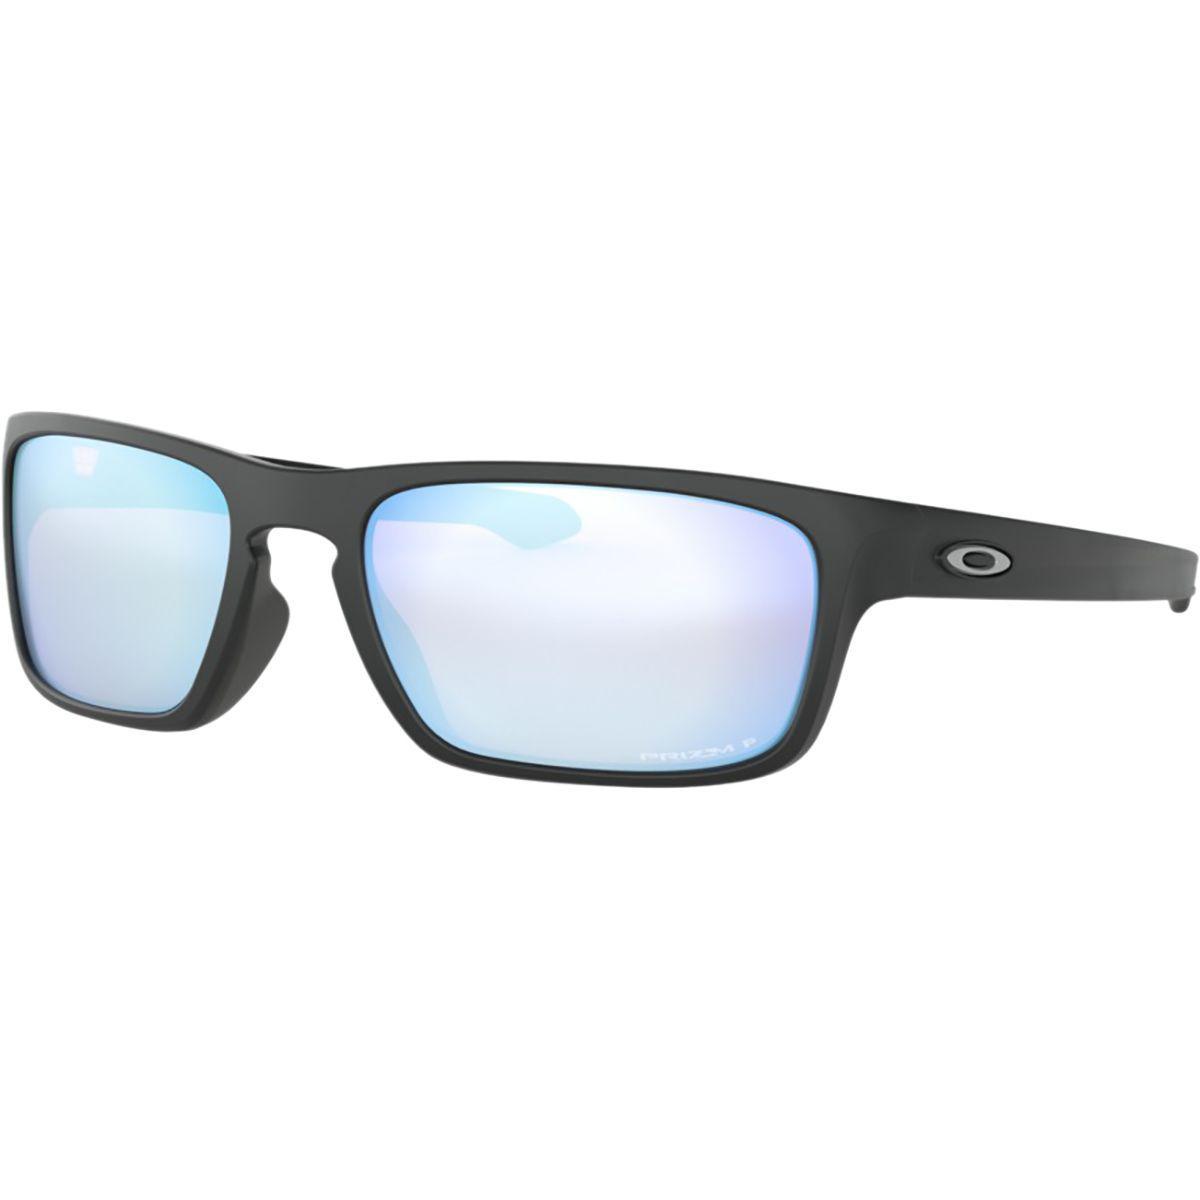 2c8c78ccae Lyst - Oakley Sliver Stealth Prizm Polarized Sunglasses in Black for Men